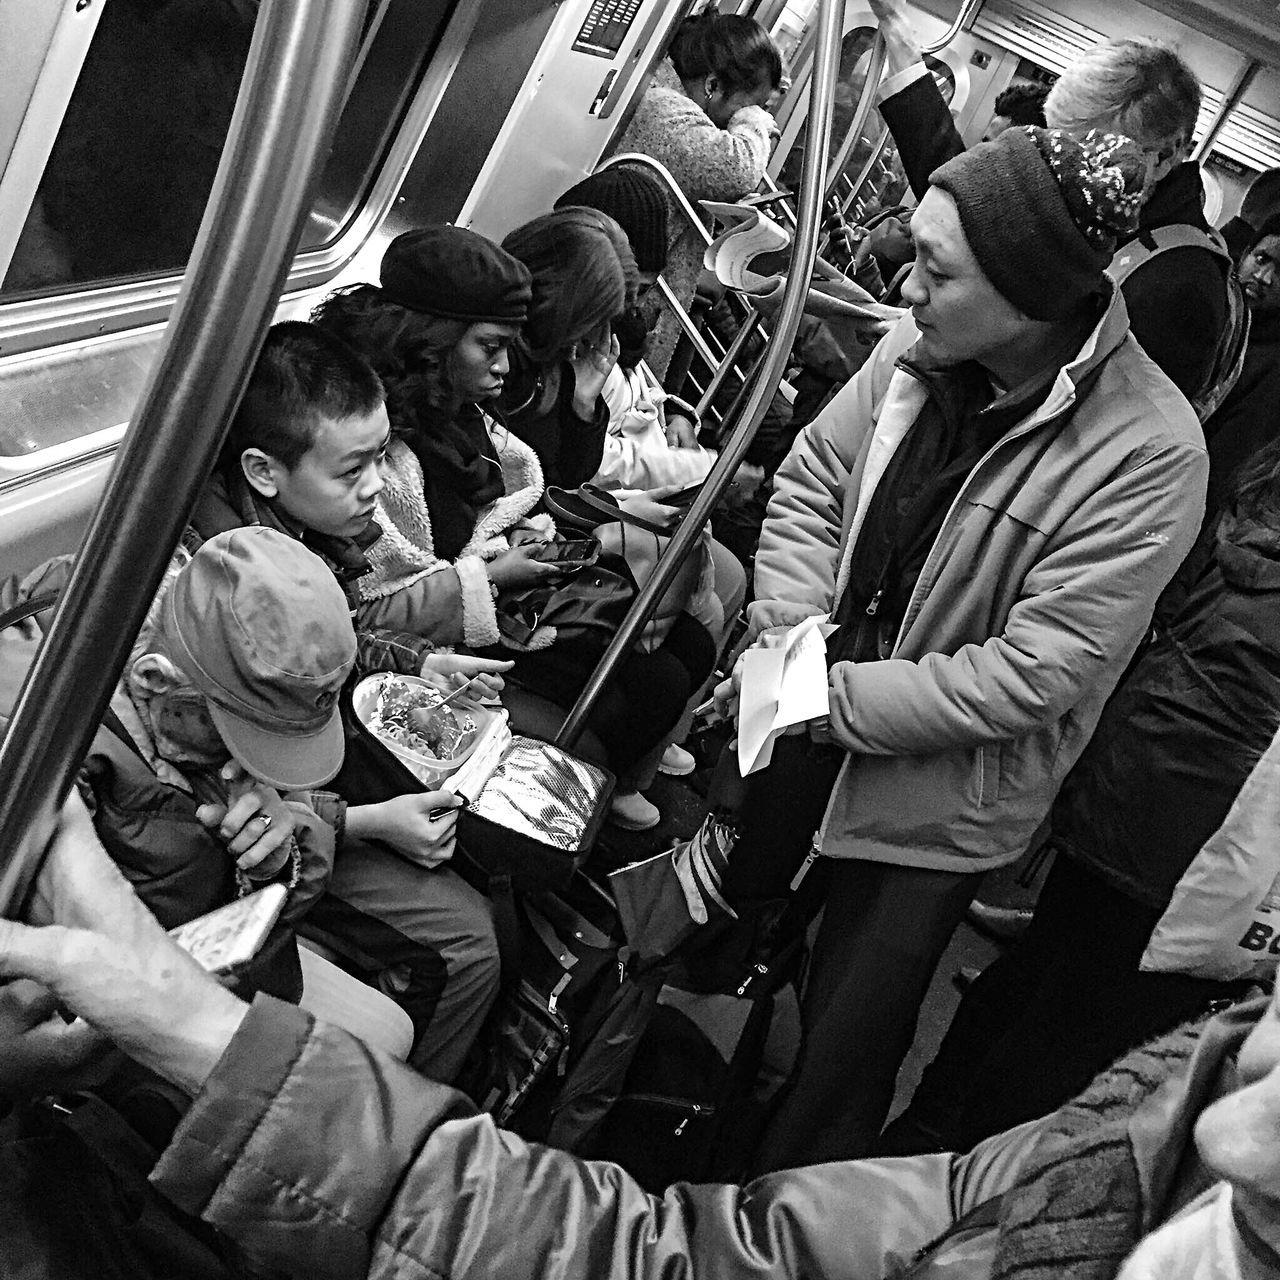 Parenthood Children Childhood Subway Train Train - Vehicle Transportation Vehicle Interior Passenger Public Transportation Commuter People Adult Crowd Adults Only Mta Streetphotography New York City Blackandwhite BestofEyeEm Blackandwhitephotography